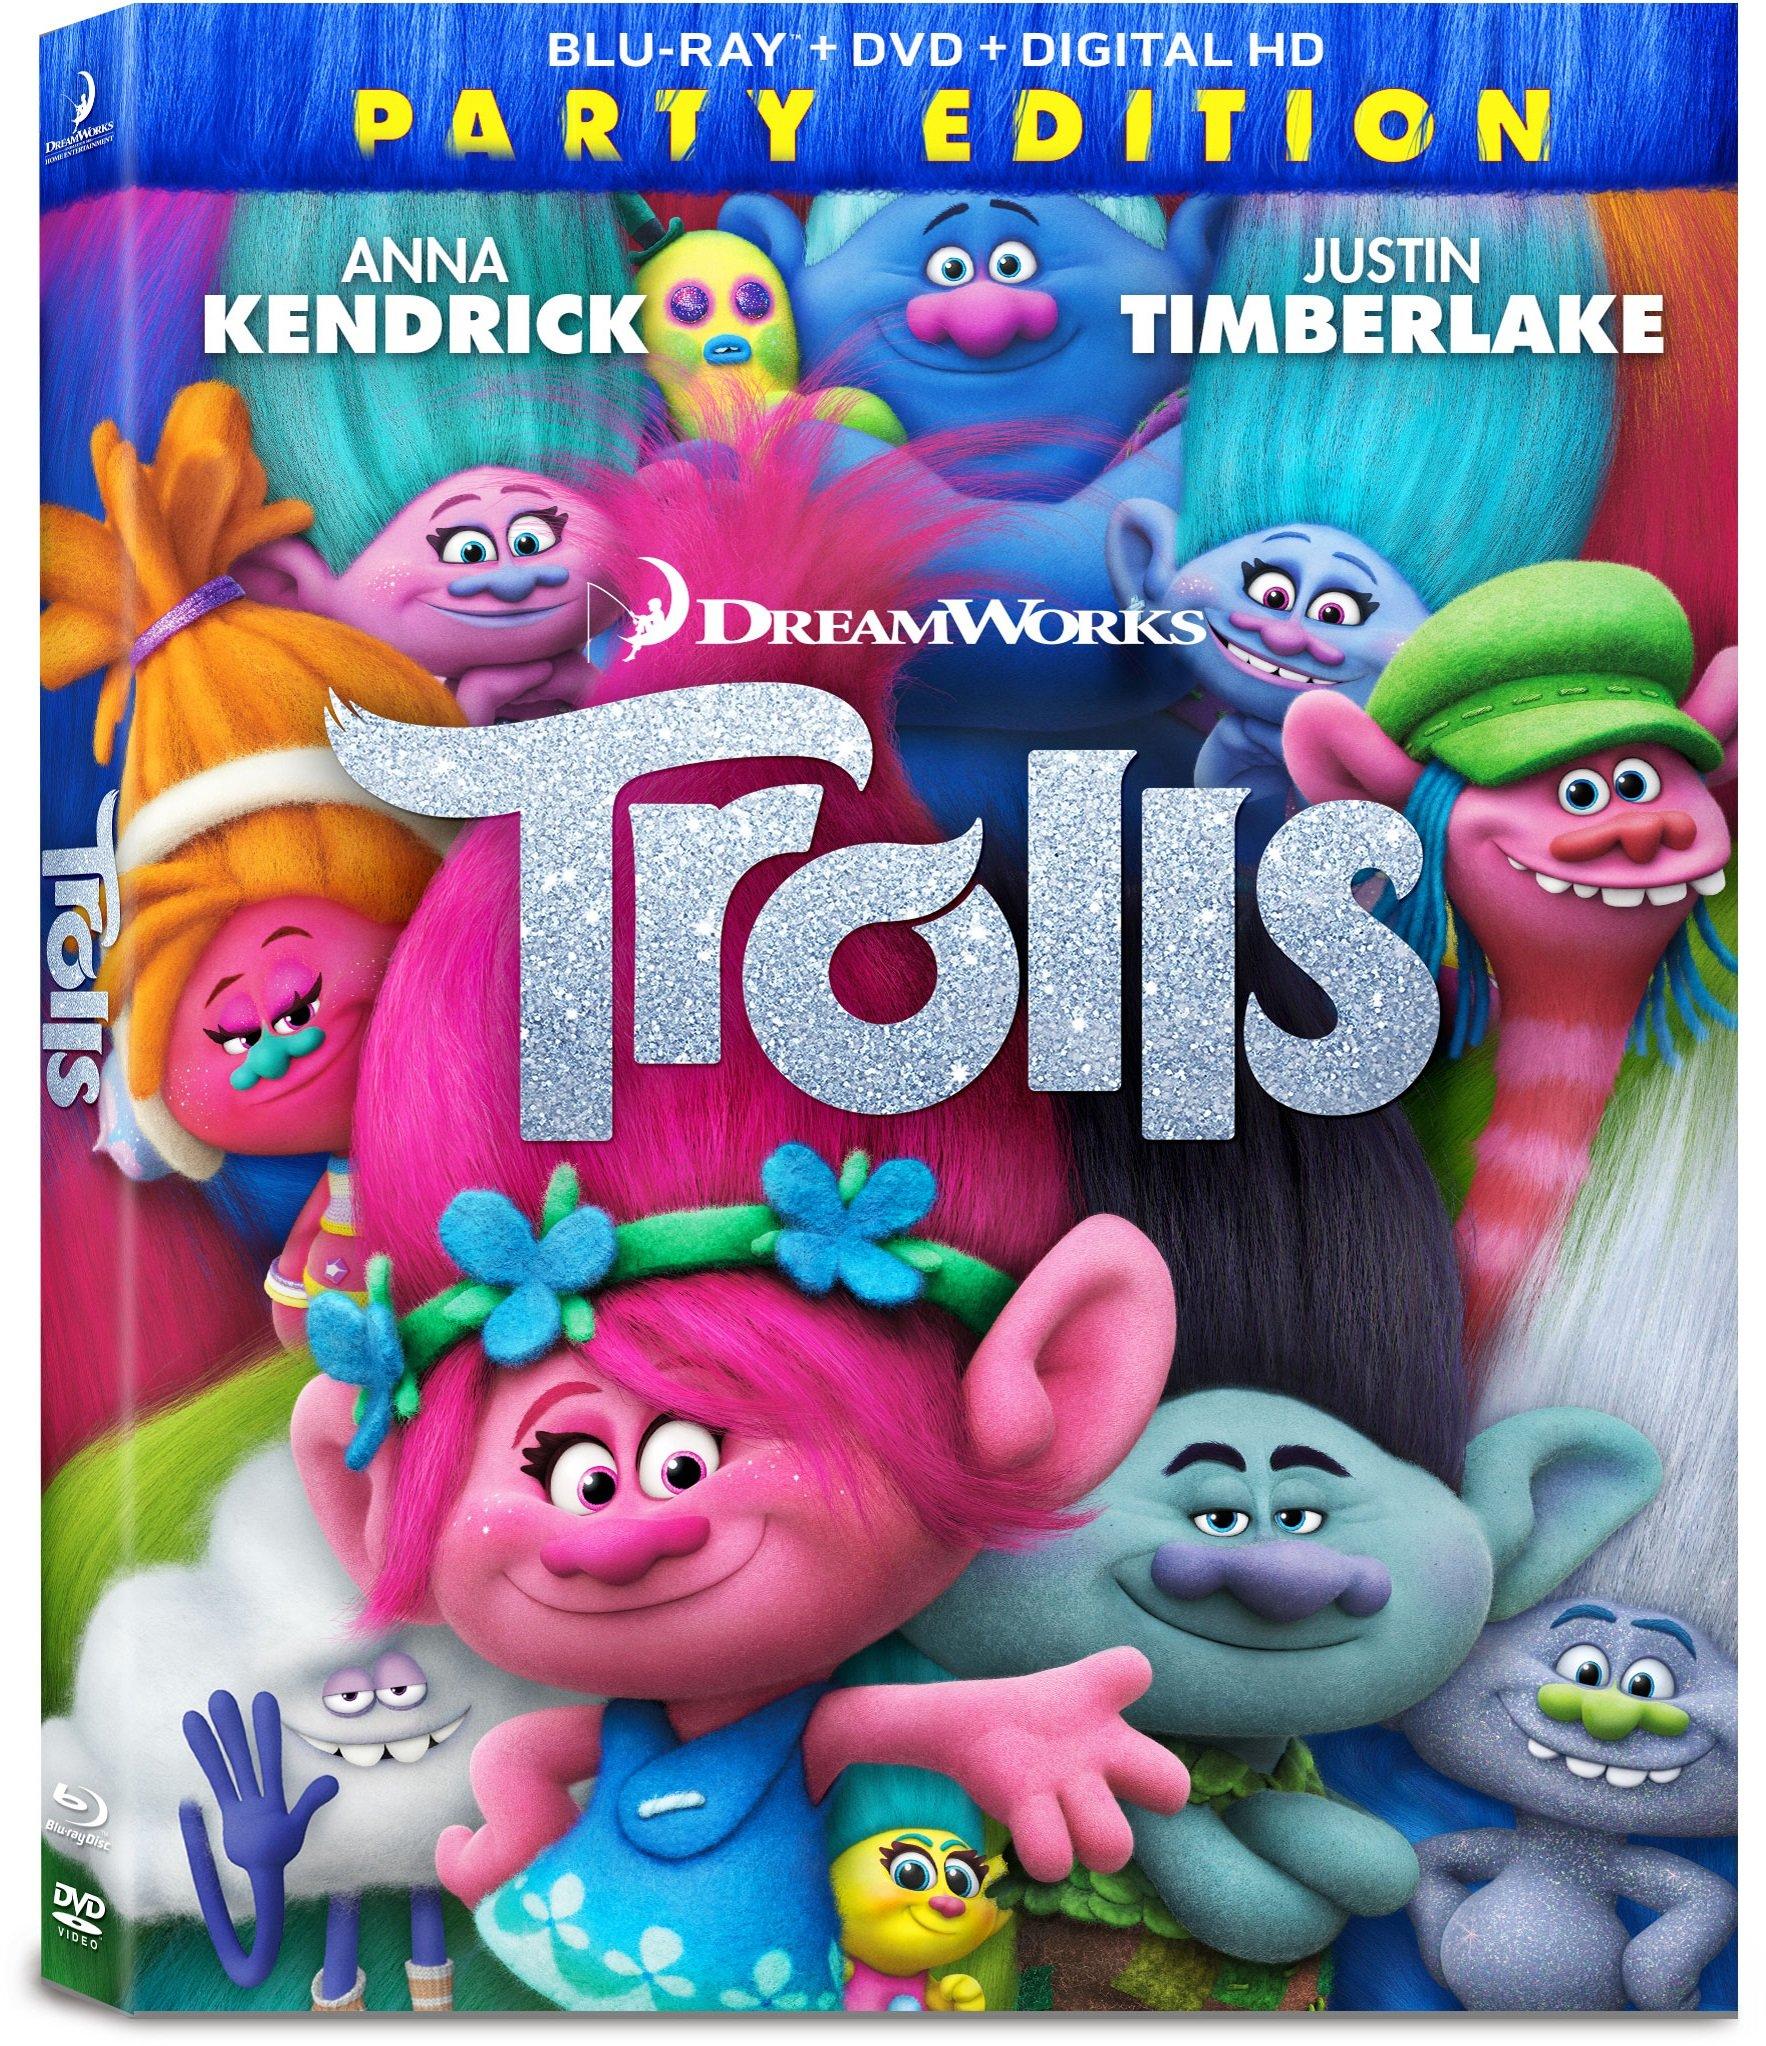 Trolls.2016.German.DTS.DL.720p.BluRay.x264.PROPER-COiNCiDENCE